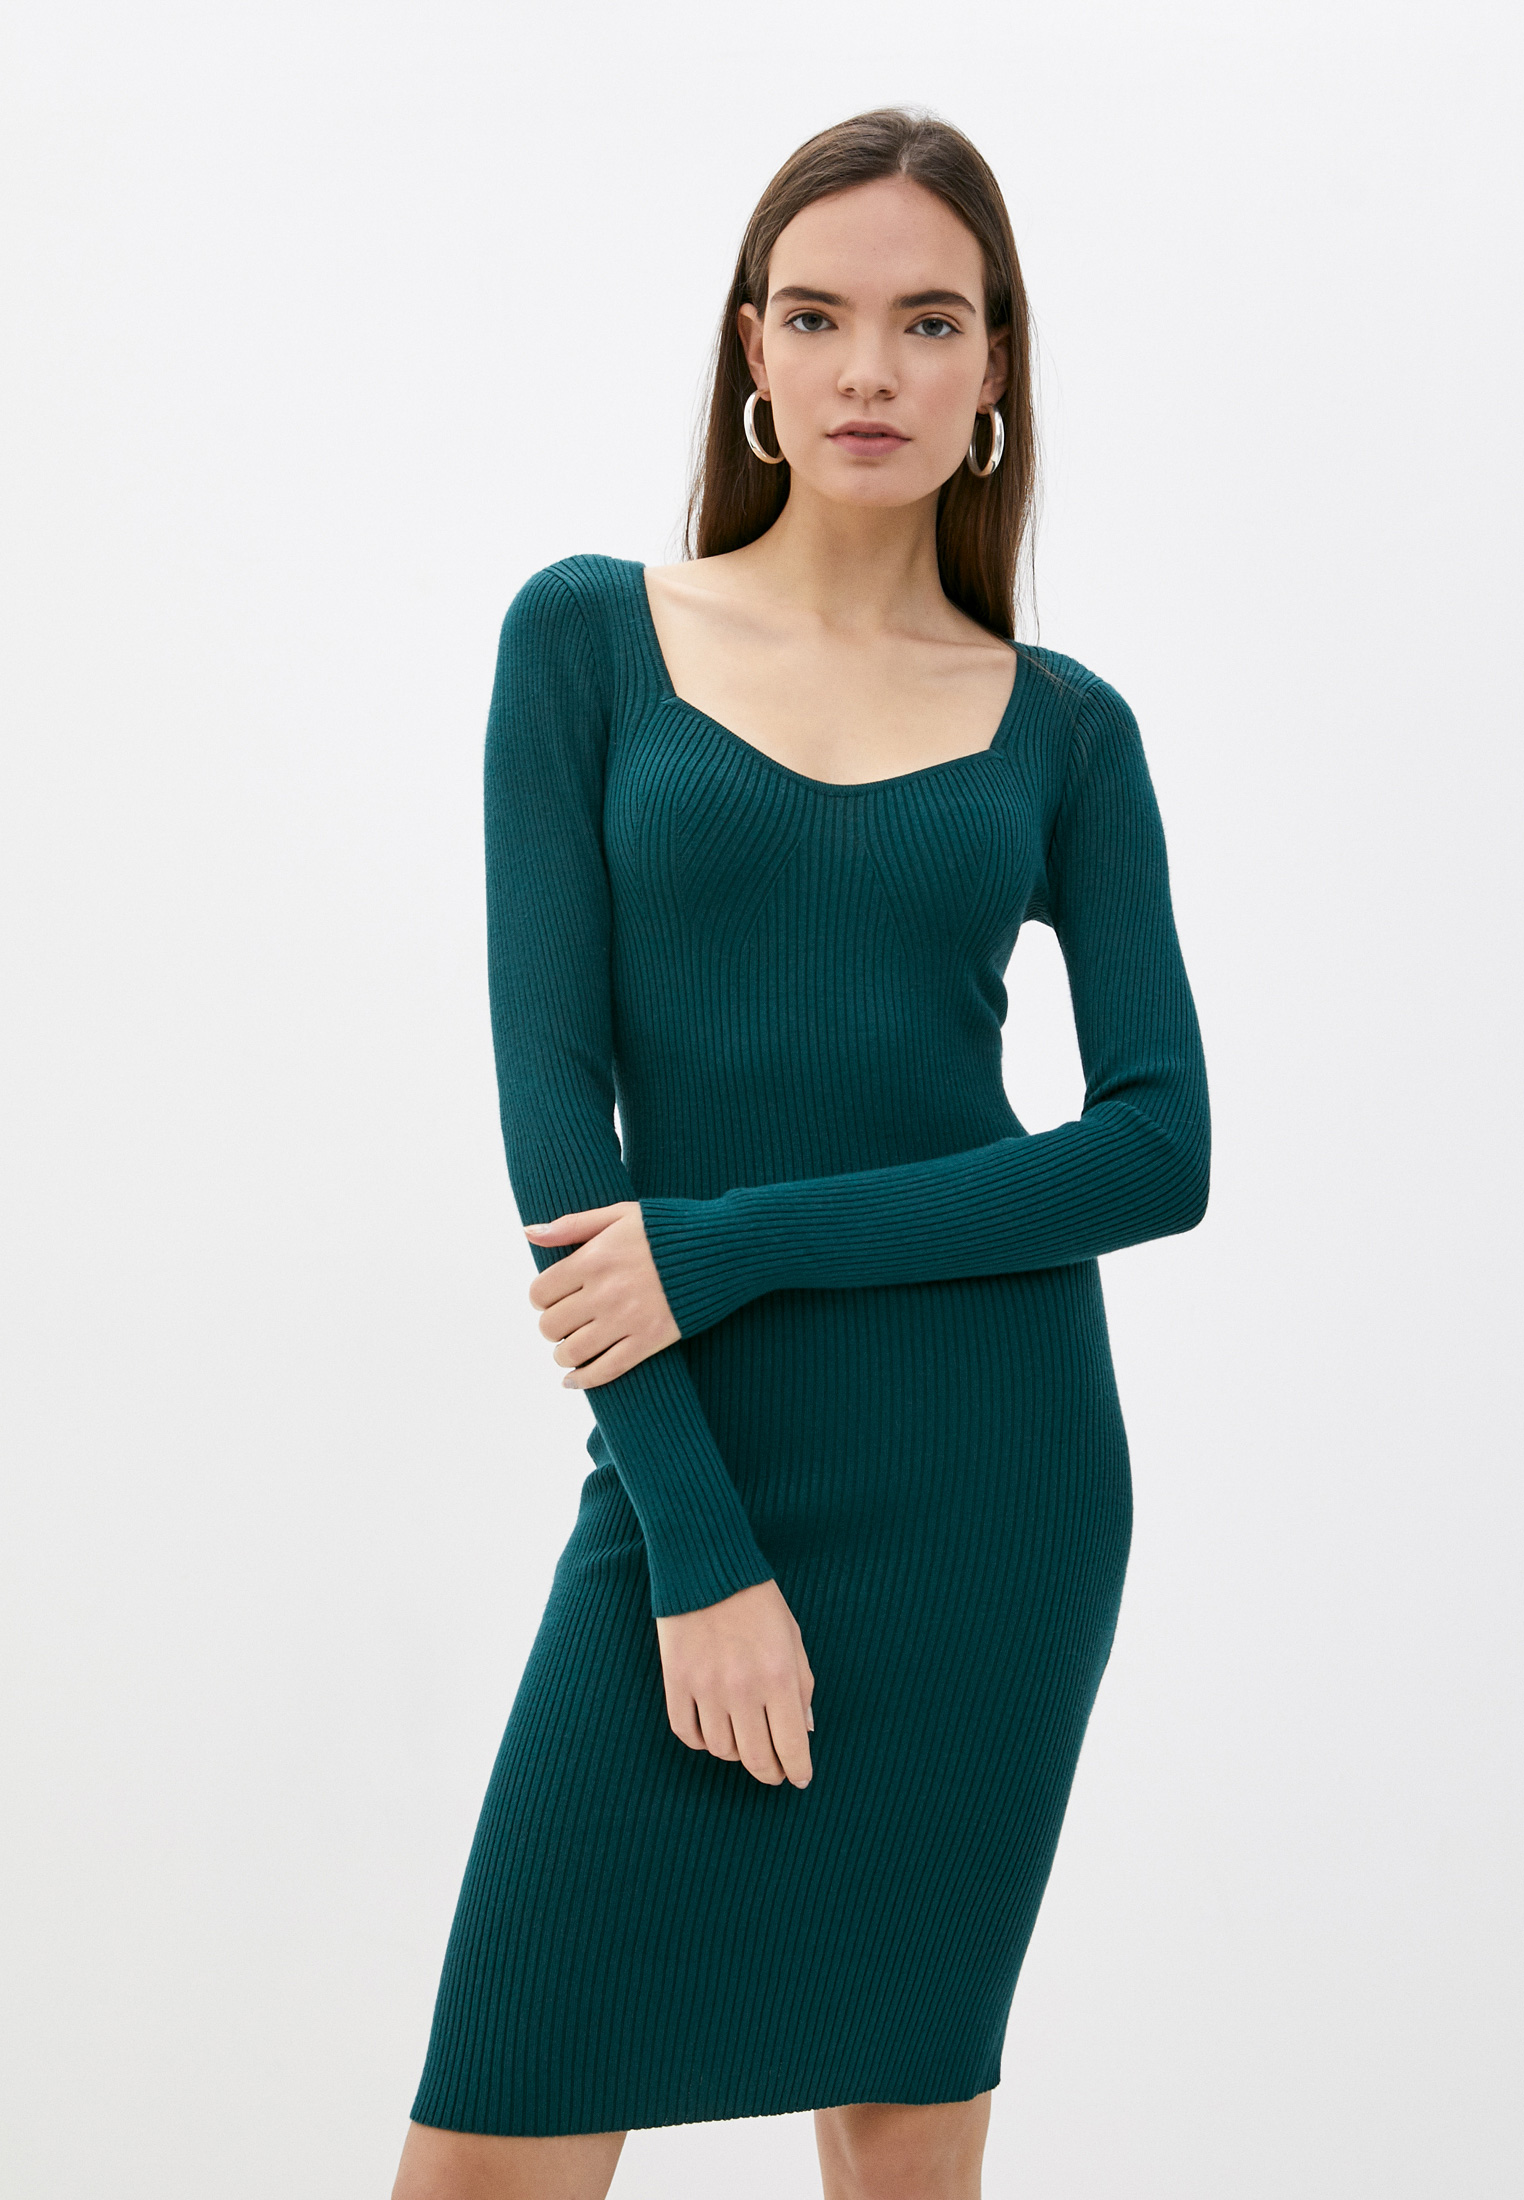 Вязаное платье Vero Moda Платье Vero Moda